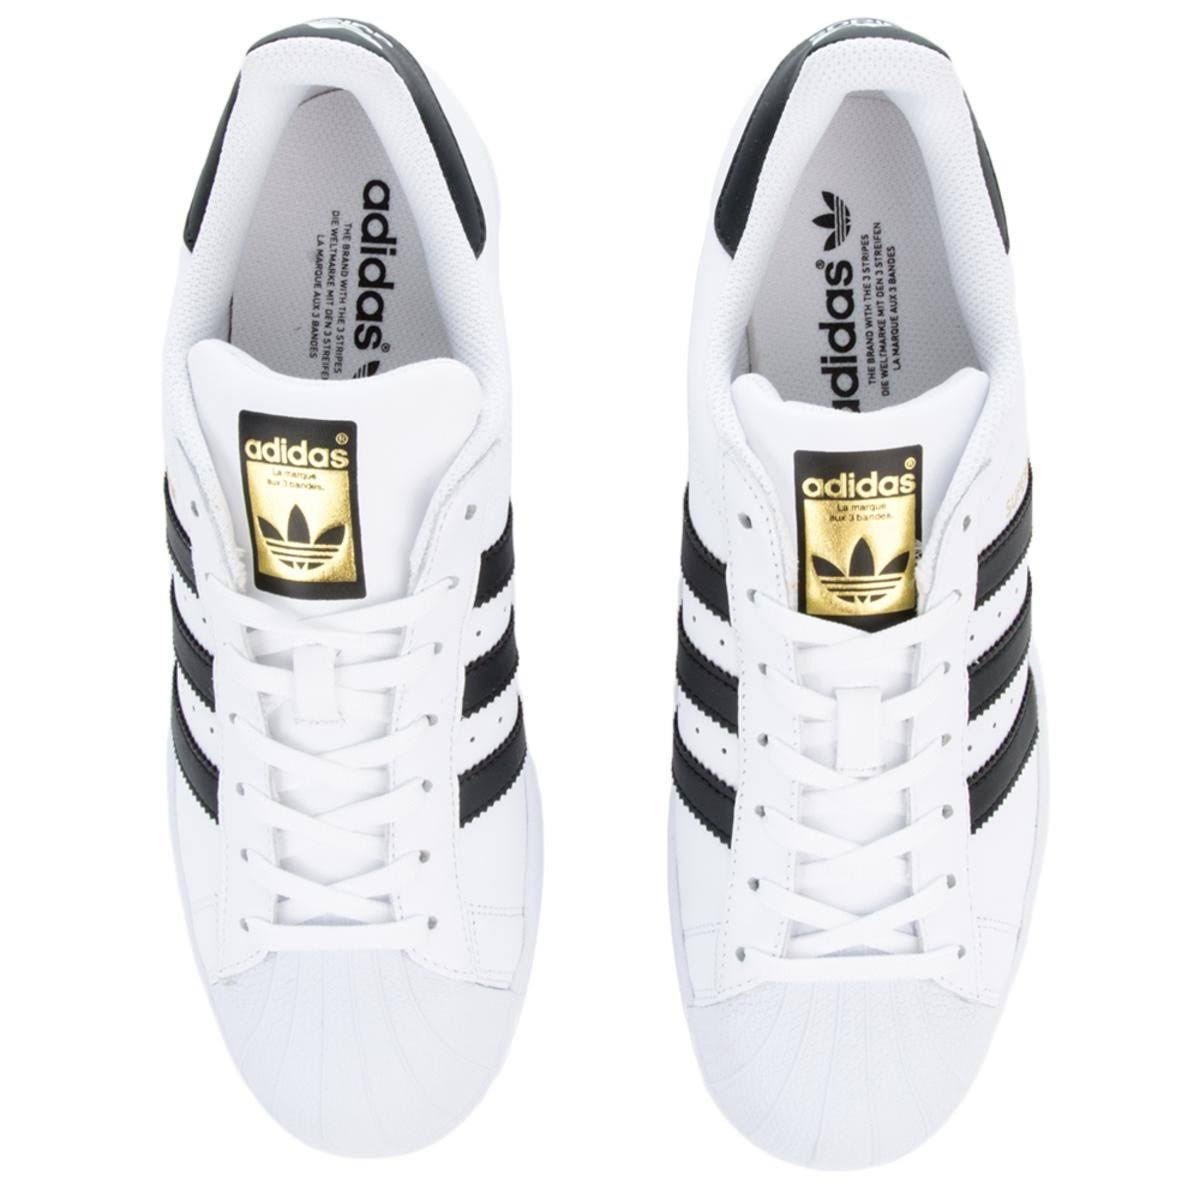 12 Superstar biancoNero Nero Adidas Bianco 5 uPXikOZ